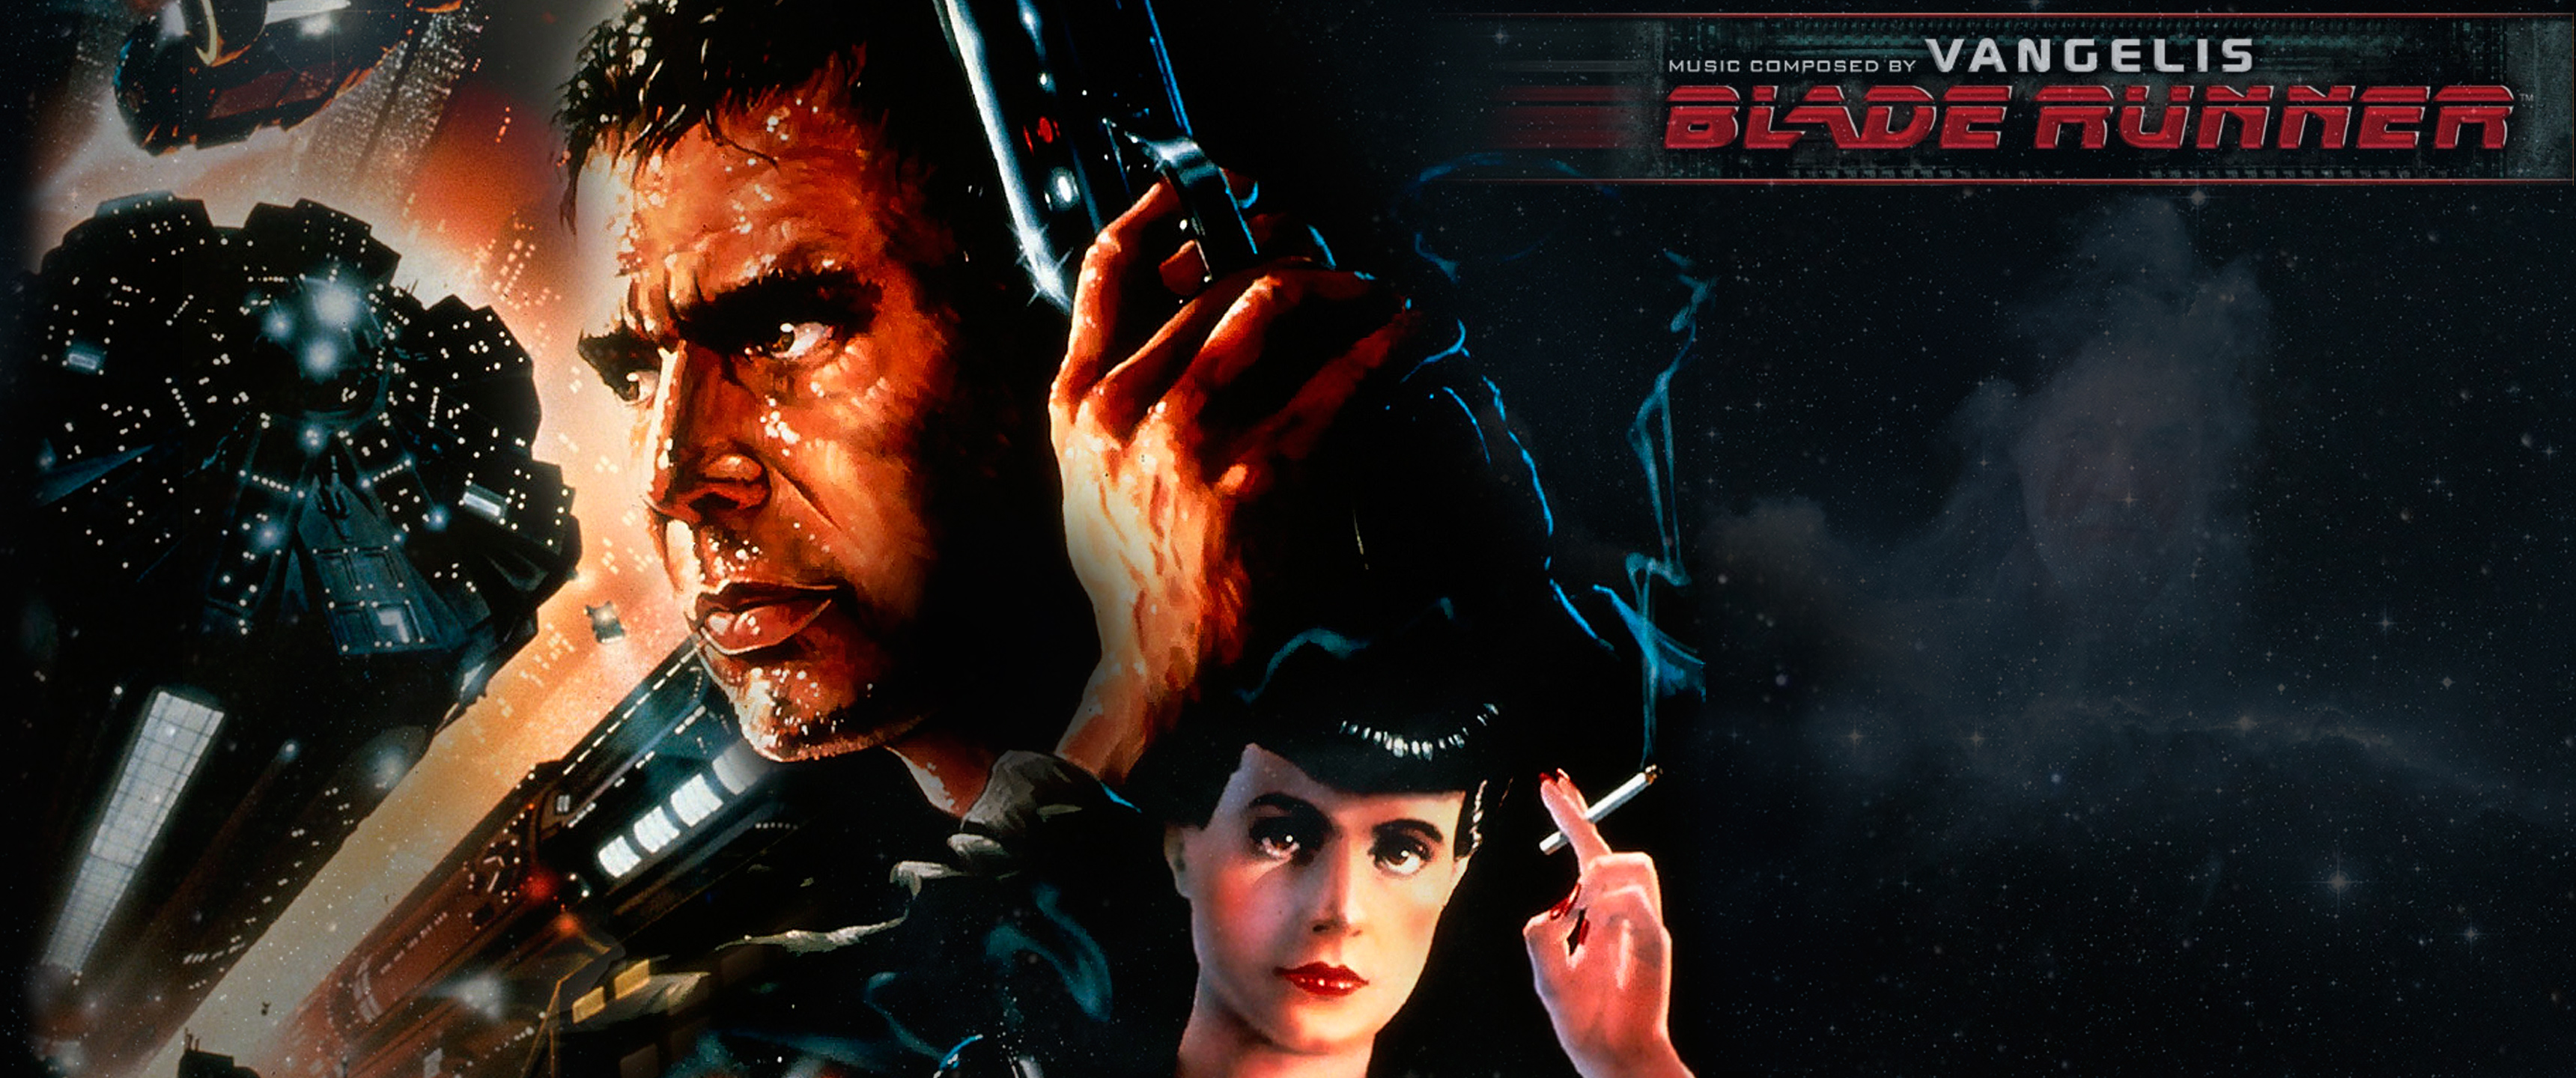 Palentino Blog Vangelis Blade Runner 4k Wallpaper